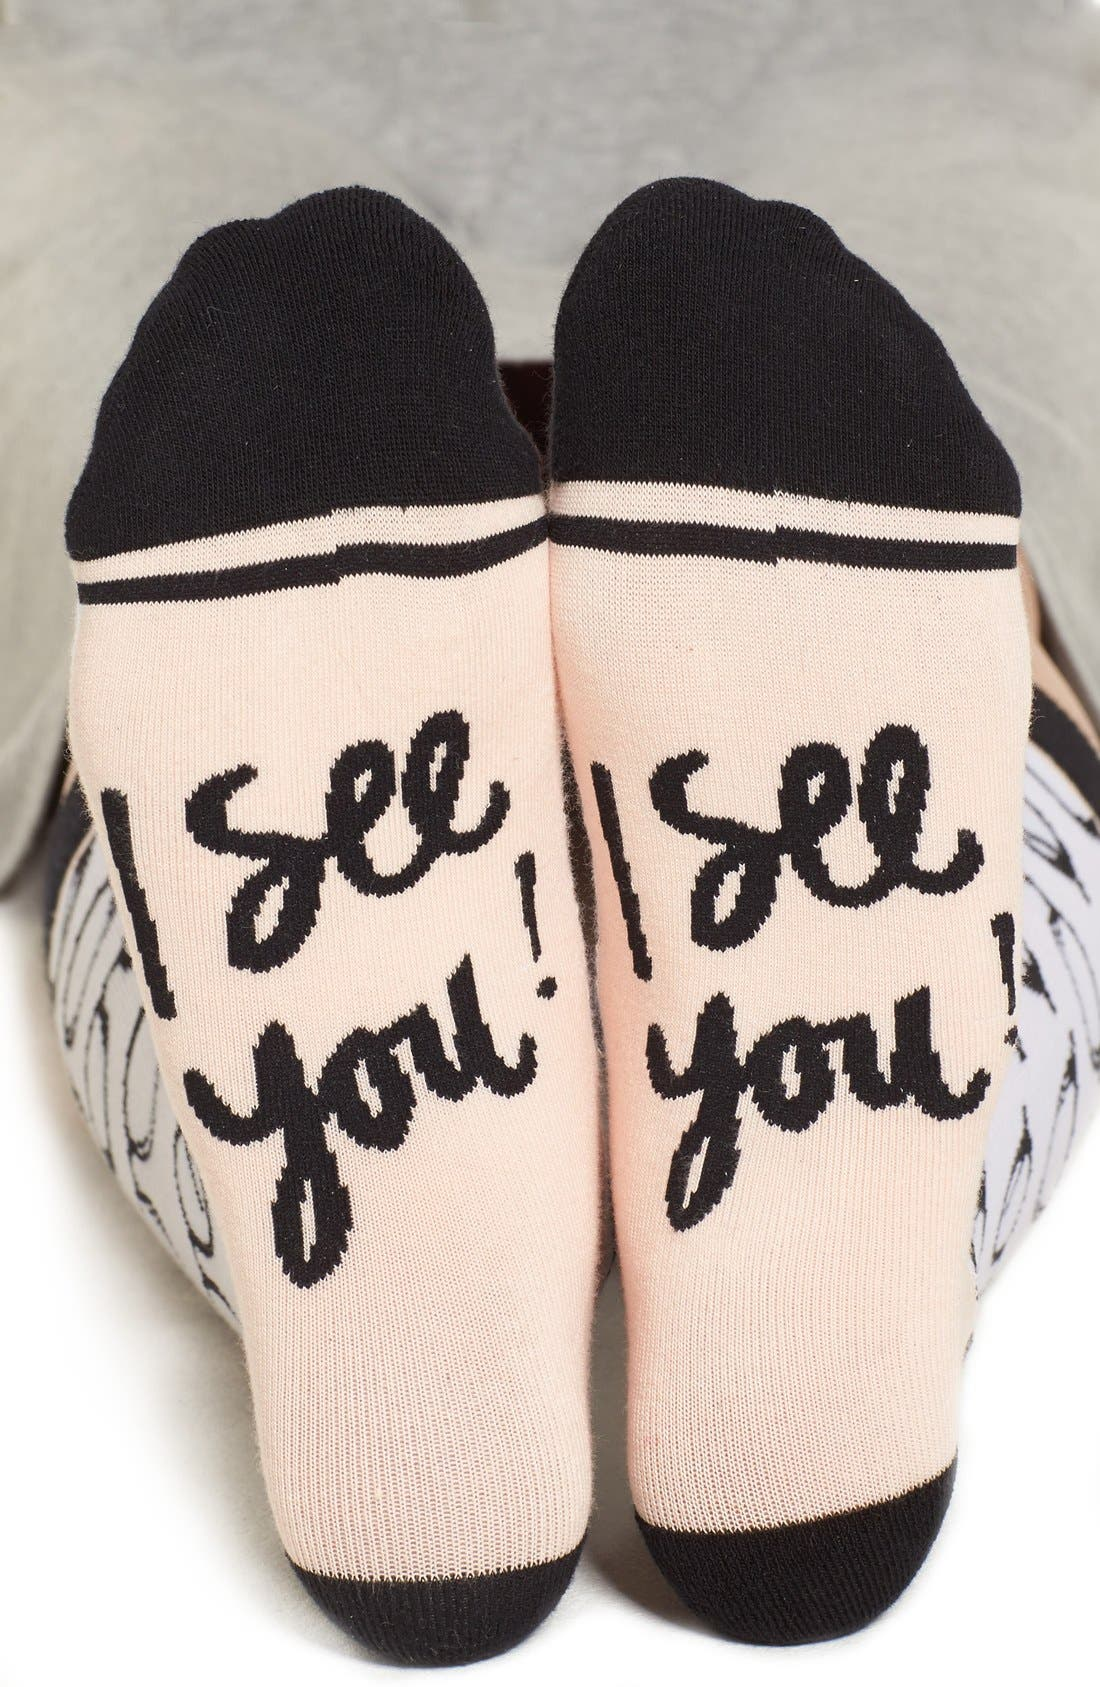 Alternate Image 2  - Woven Pear 'I See You' Crew Socks